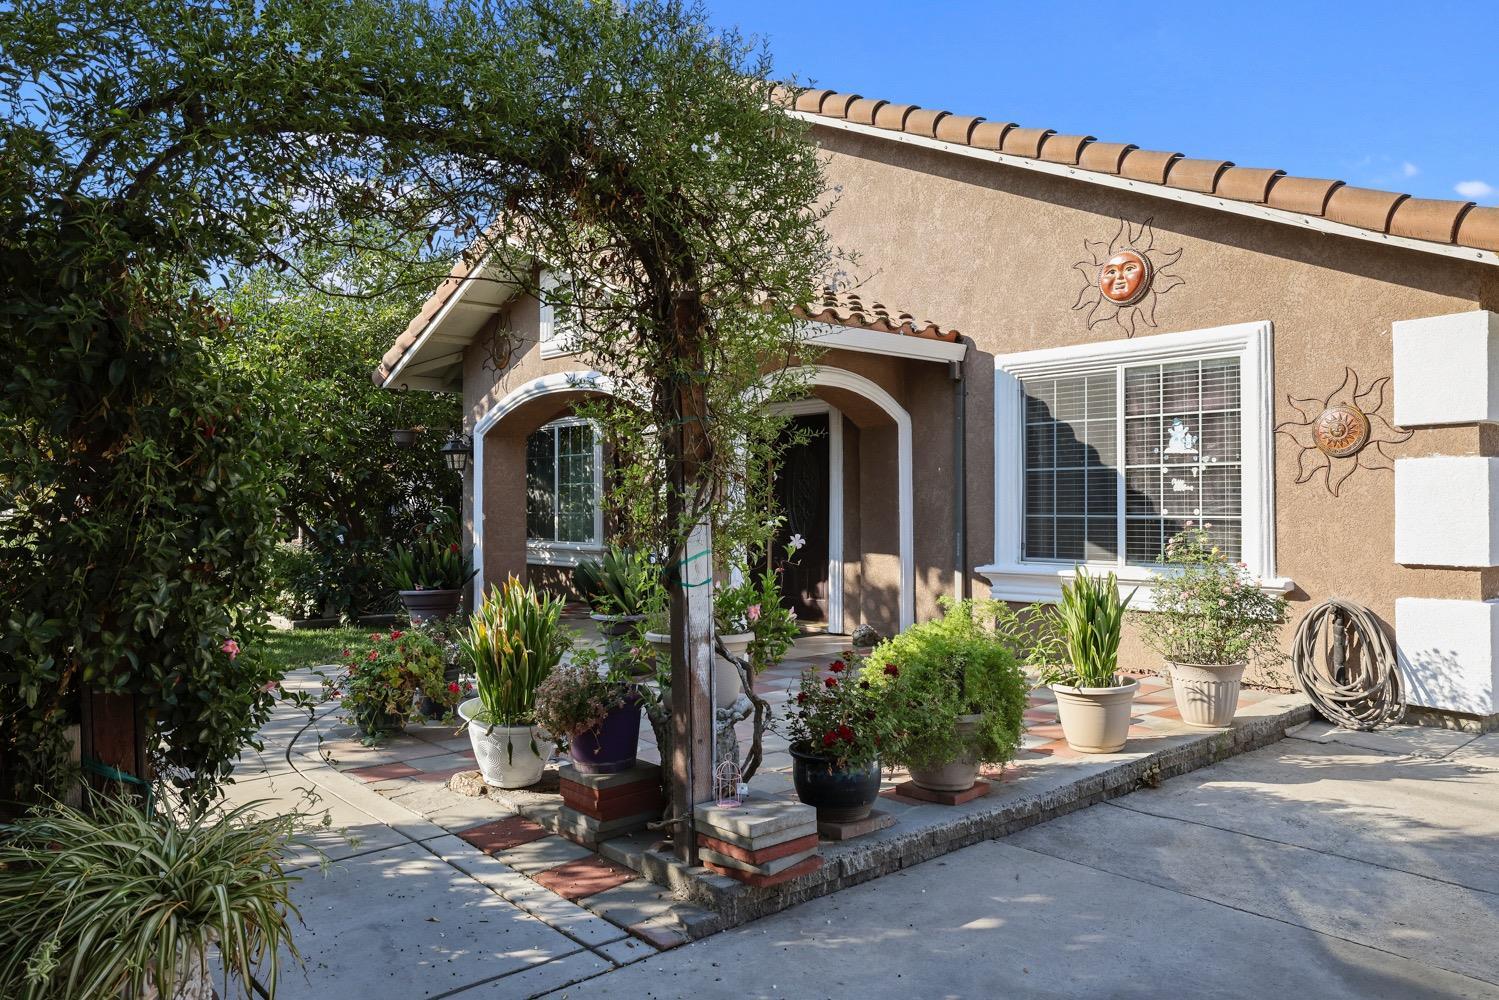 Photo of 29 S Carroll Avenue, Stockton, CA 95215